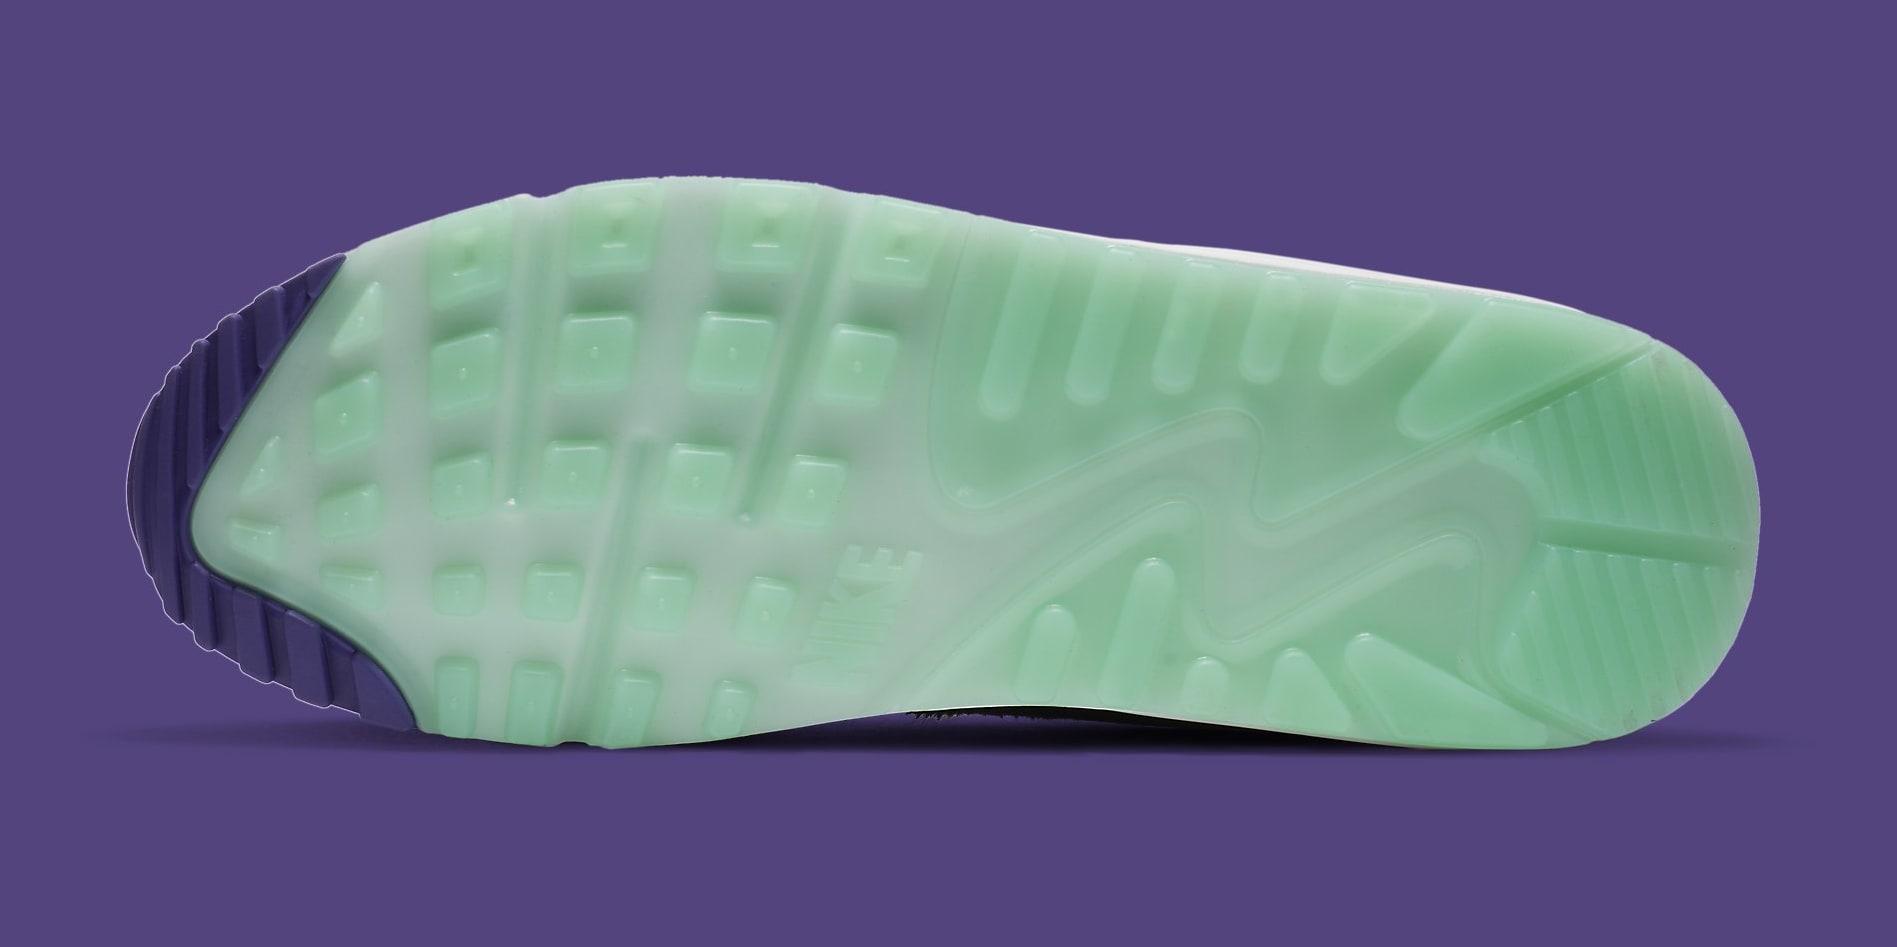 Nike Air Max 90 'Violet Blend' CZ5588-001 Outsole